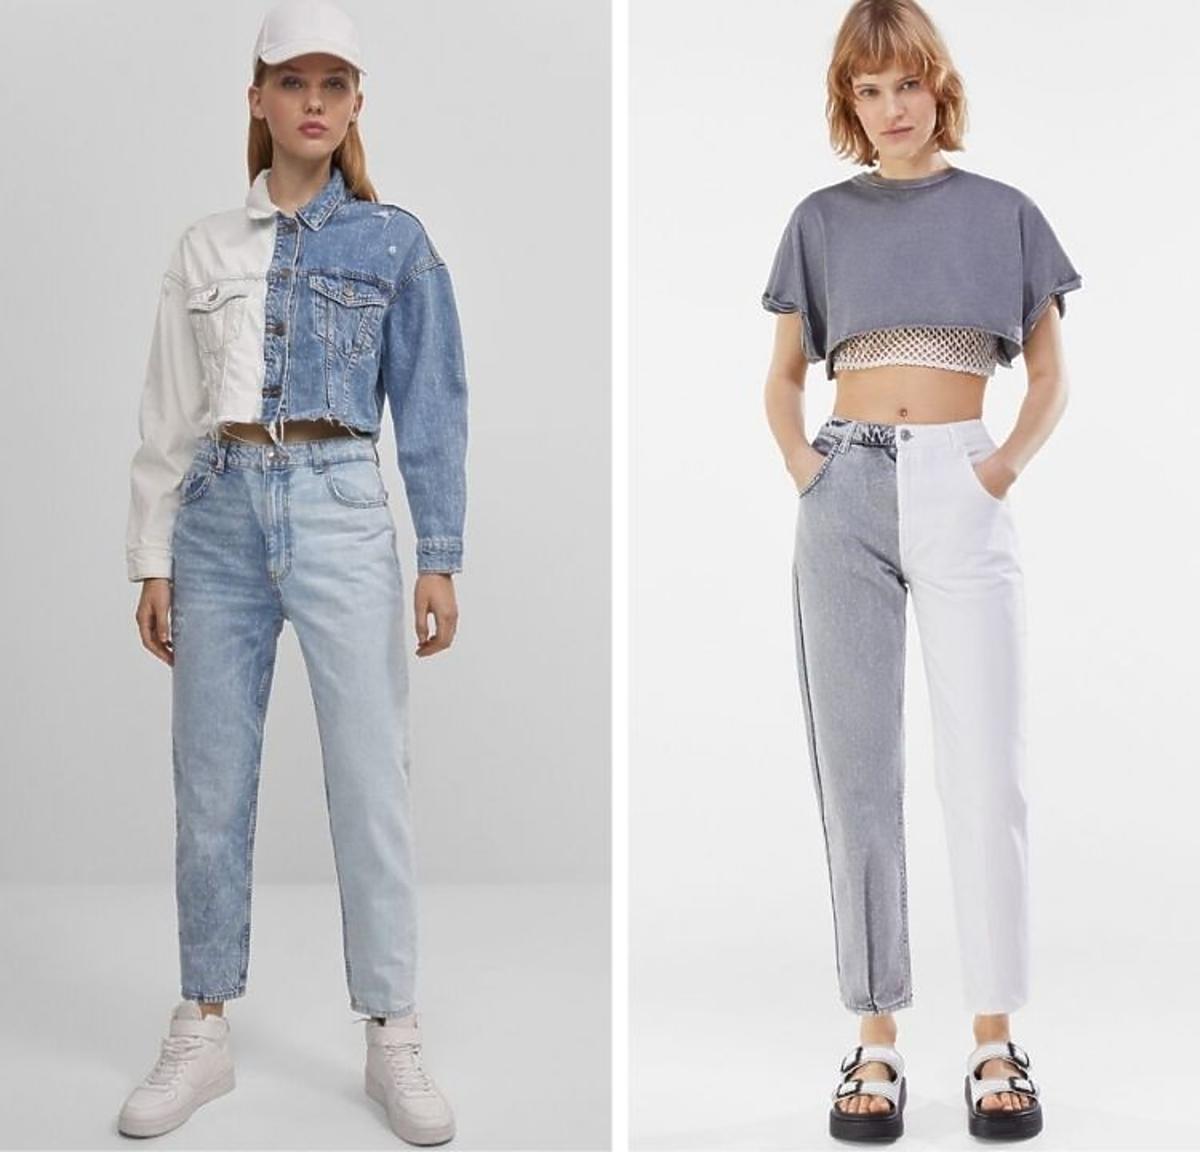 Dwukolorowe jeansy Bershka